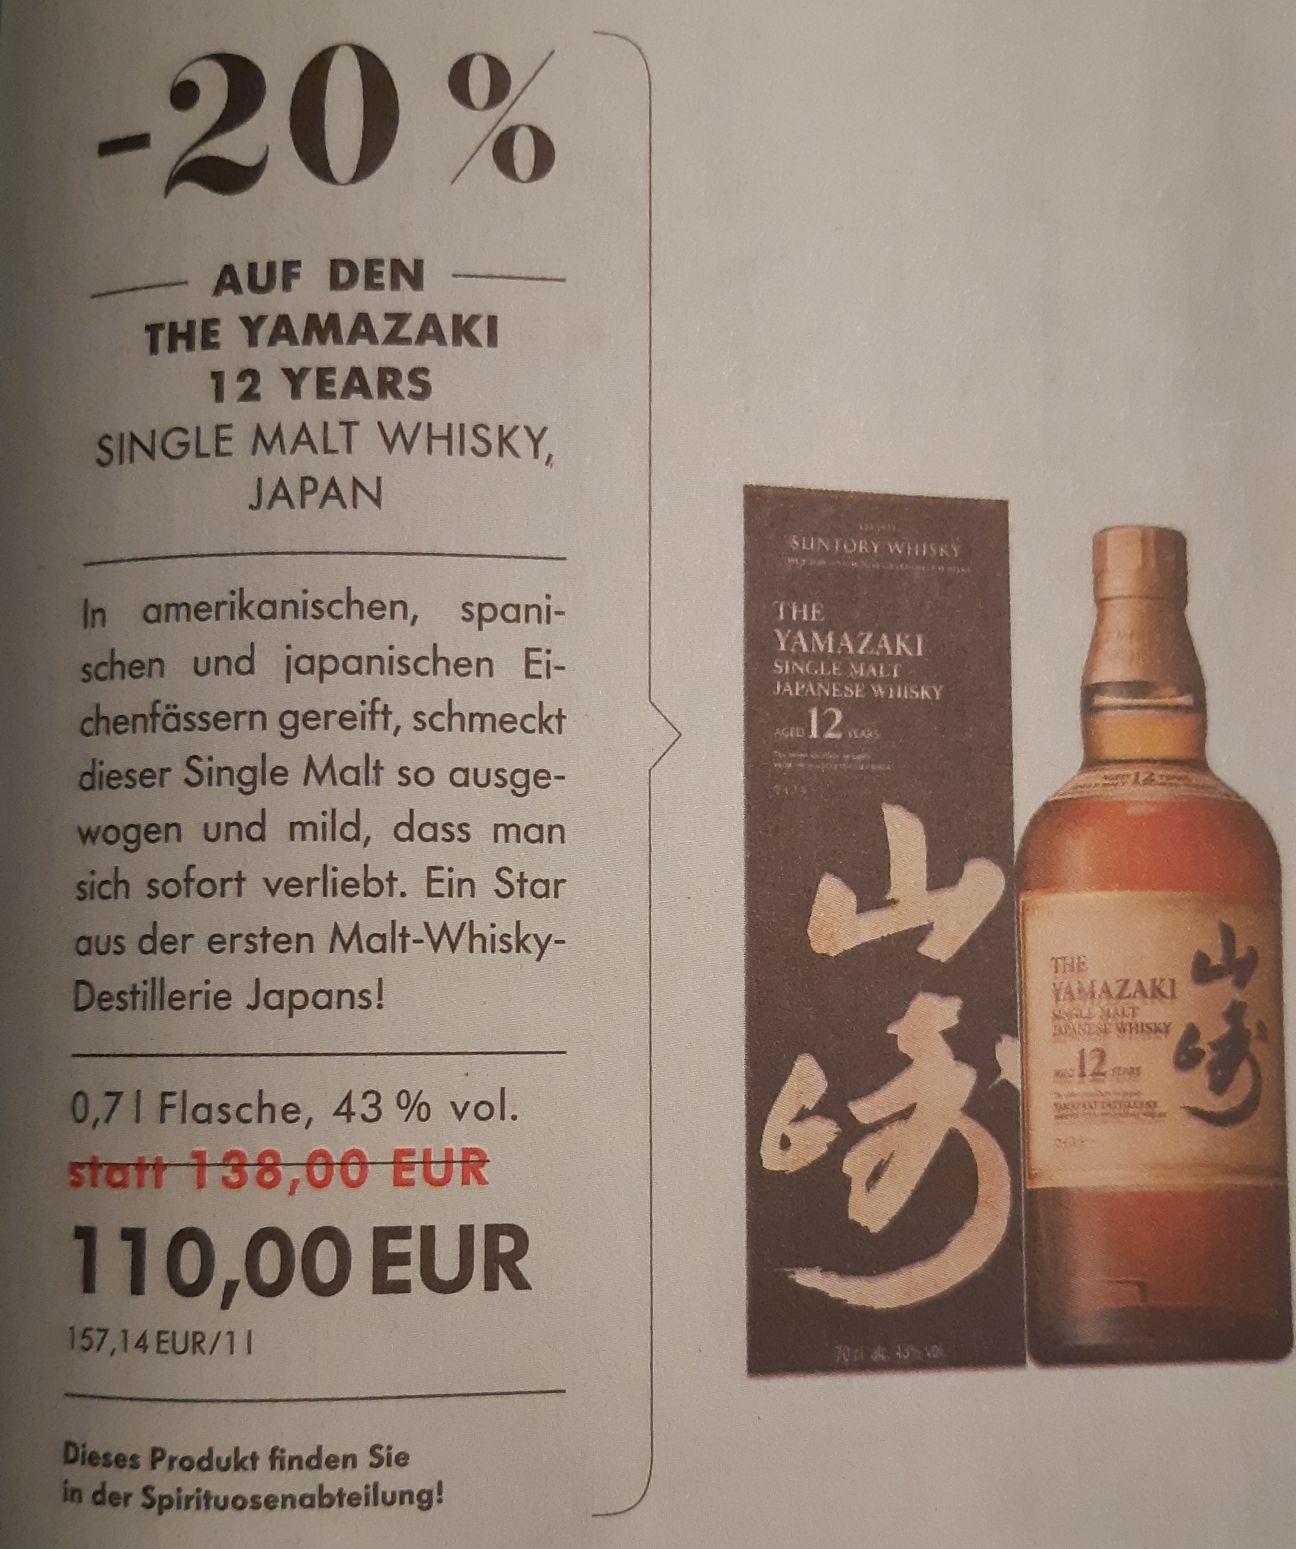 [lokal München & online] Dallmayr: Yamazaki 12 Years Single Malt Whisky